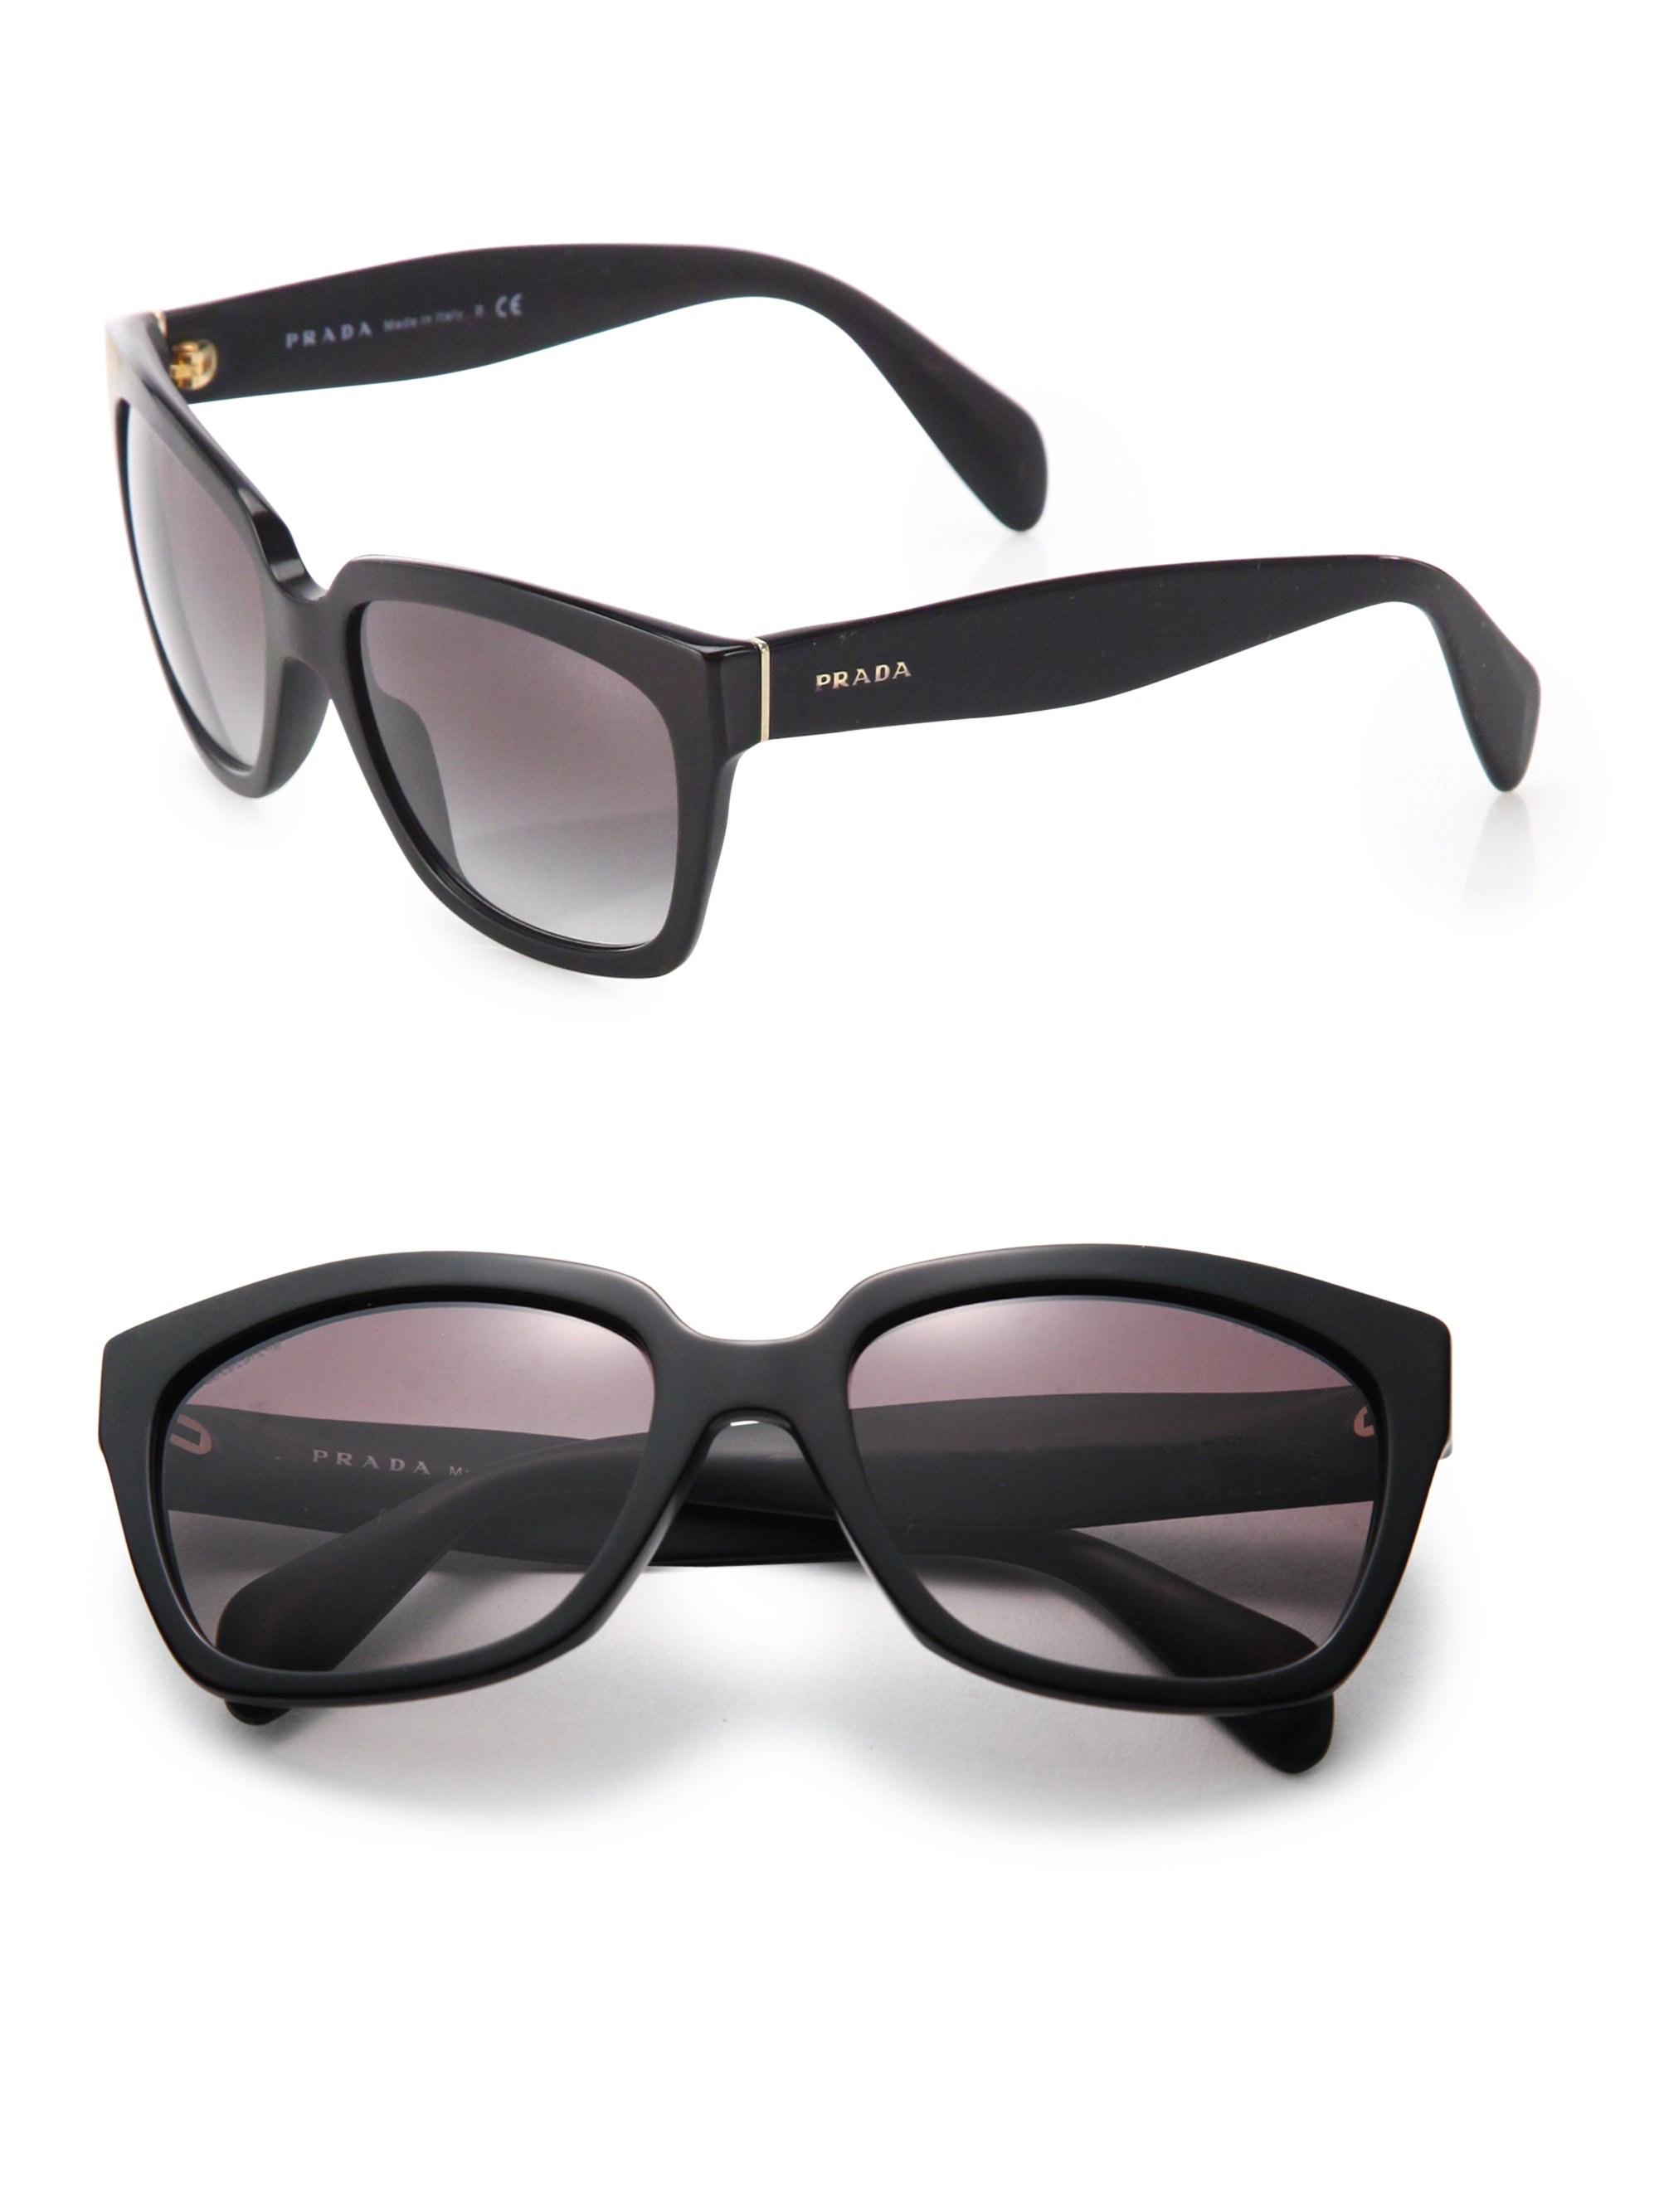 3d74dcb7bdbf Prada Sunglasses Online Shopping India